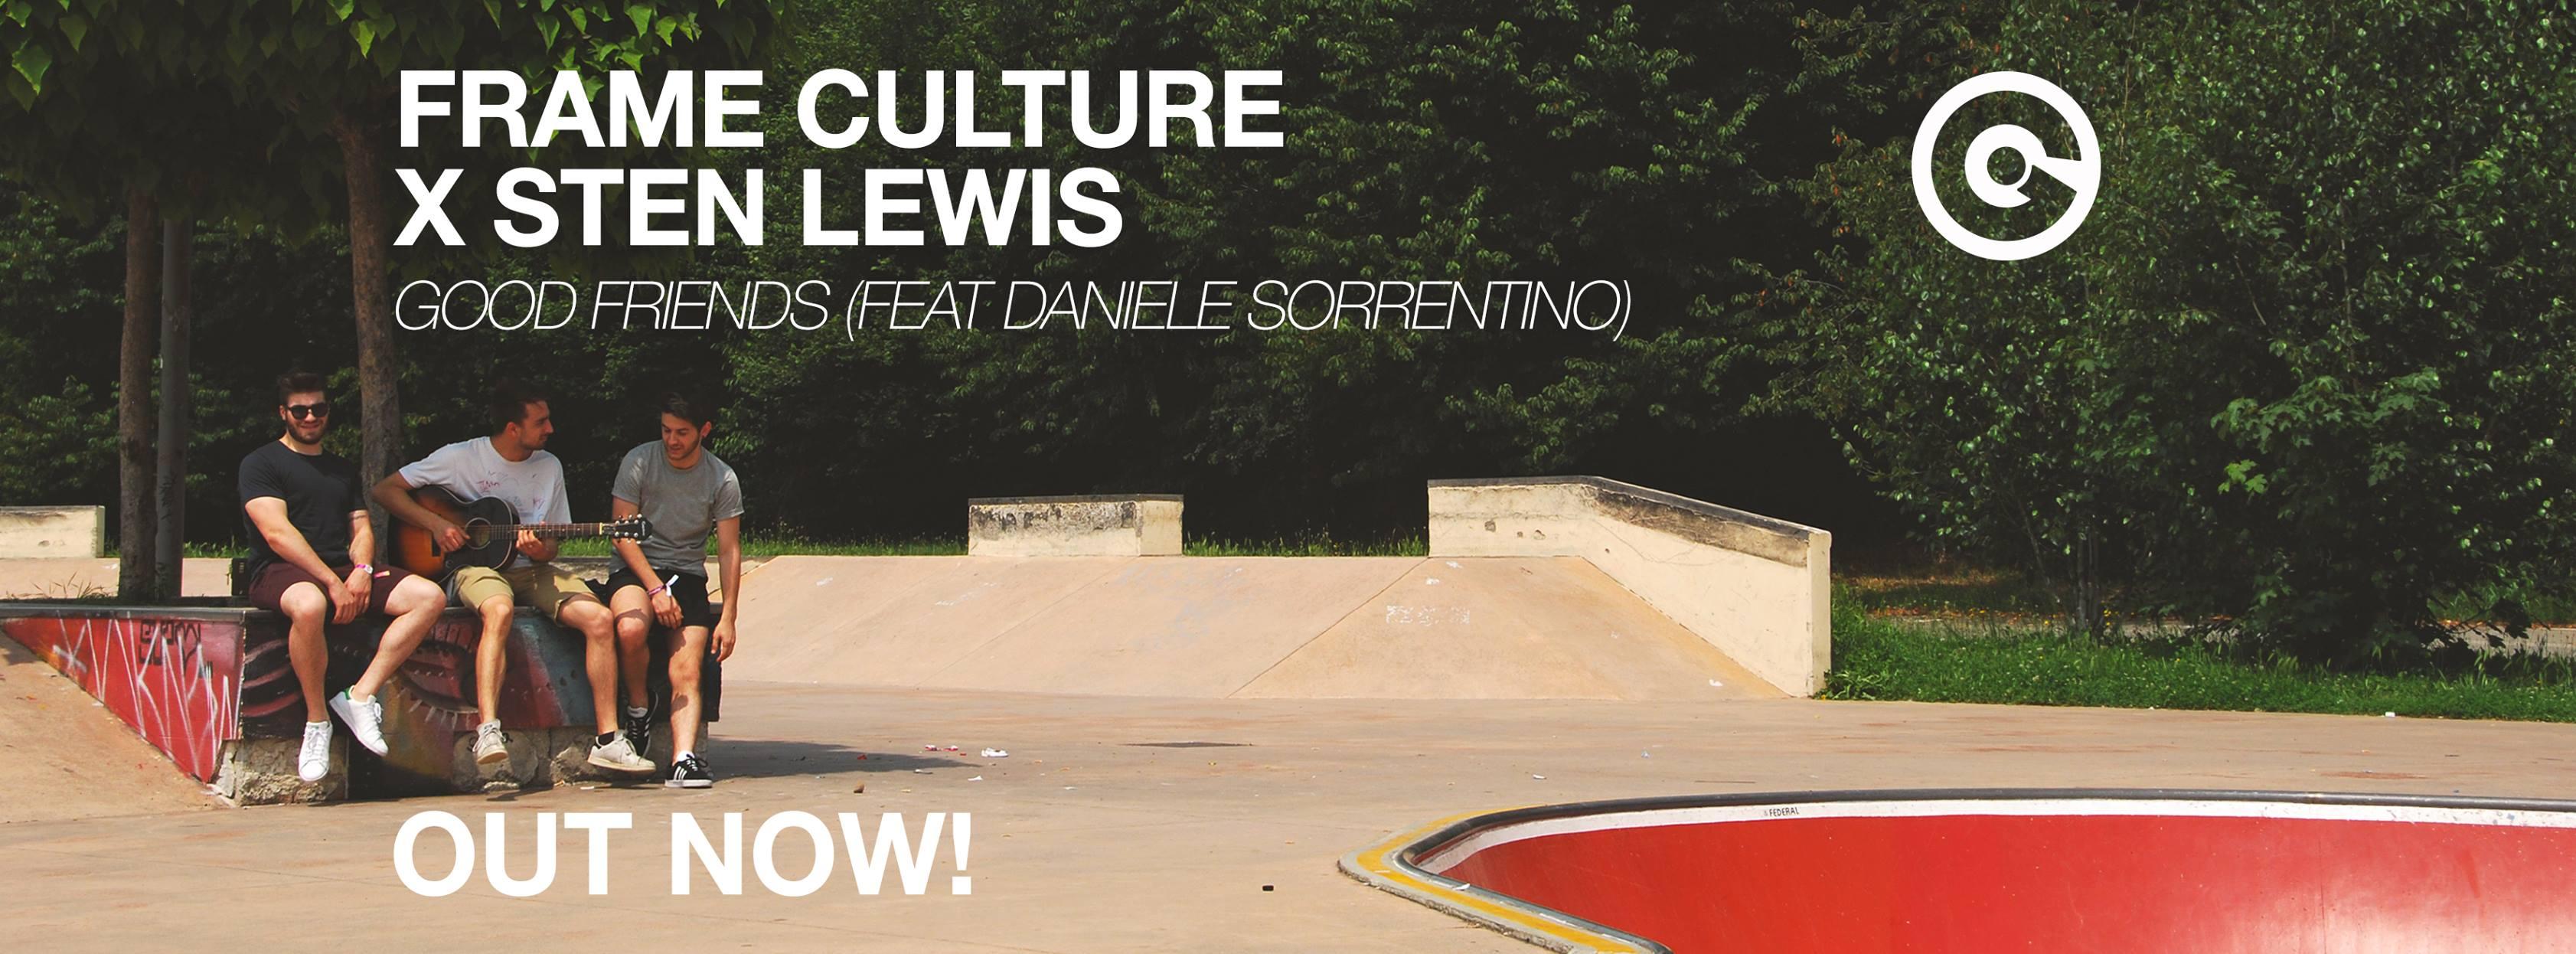 "Nuova collaborazione per Daniele Sorrentino: ""Good Friends"" ft. Frame Culture x Sten Lewis for EGO."